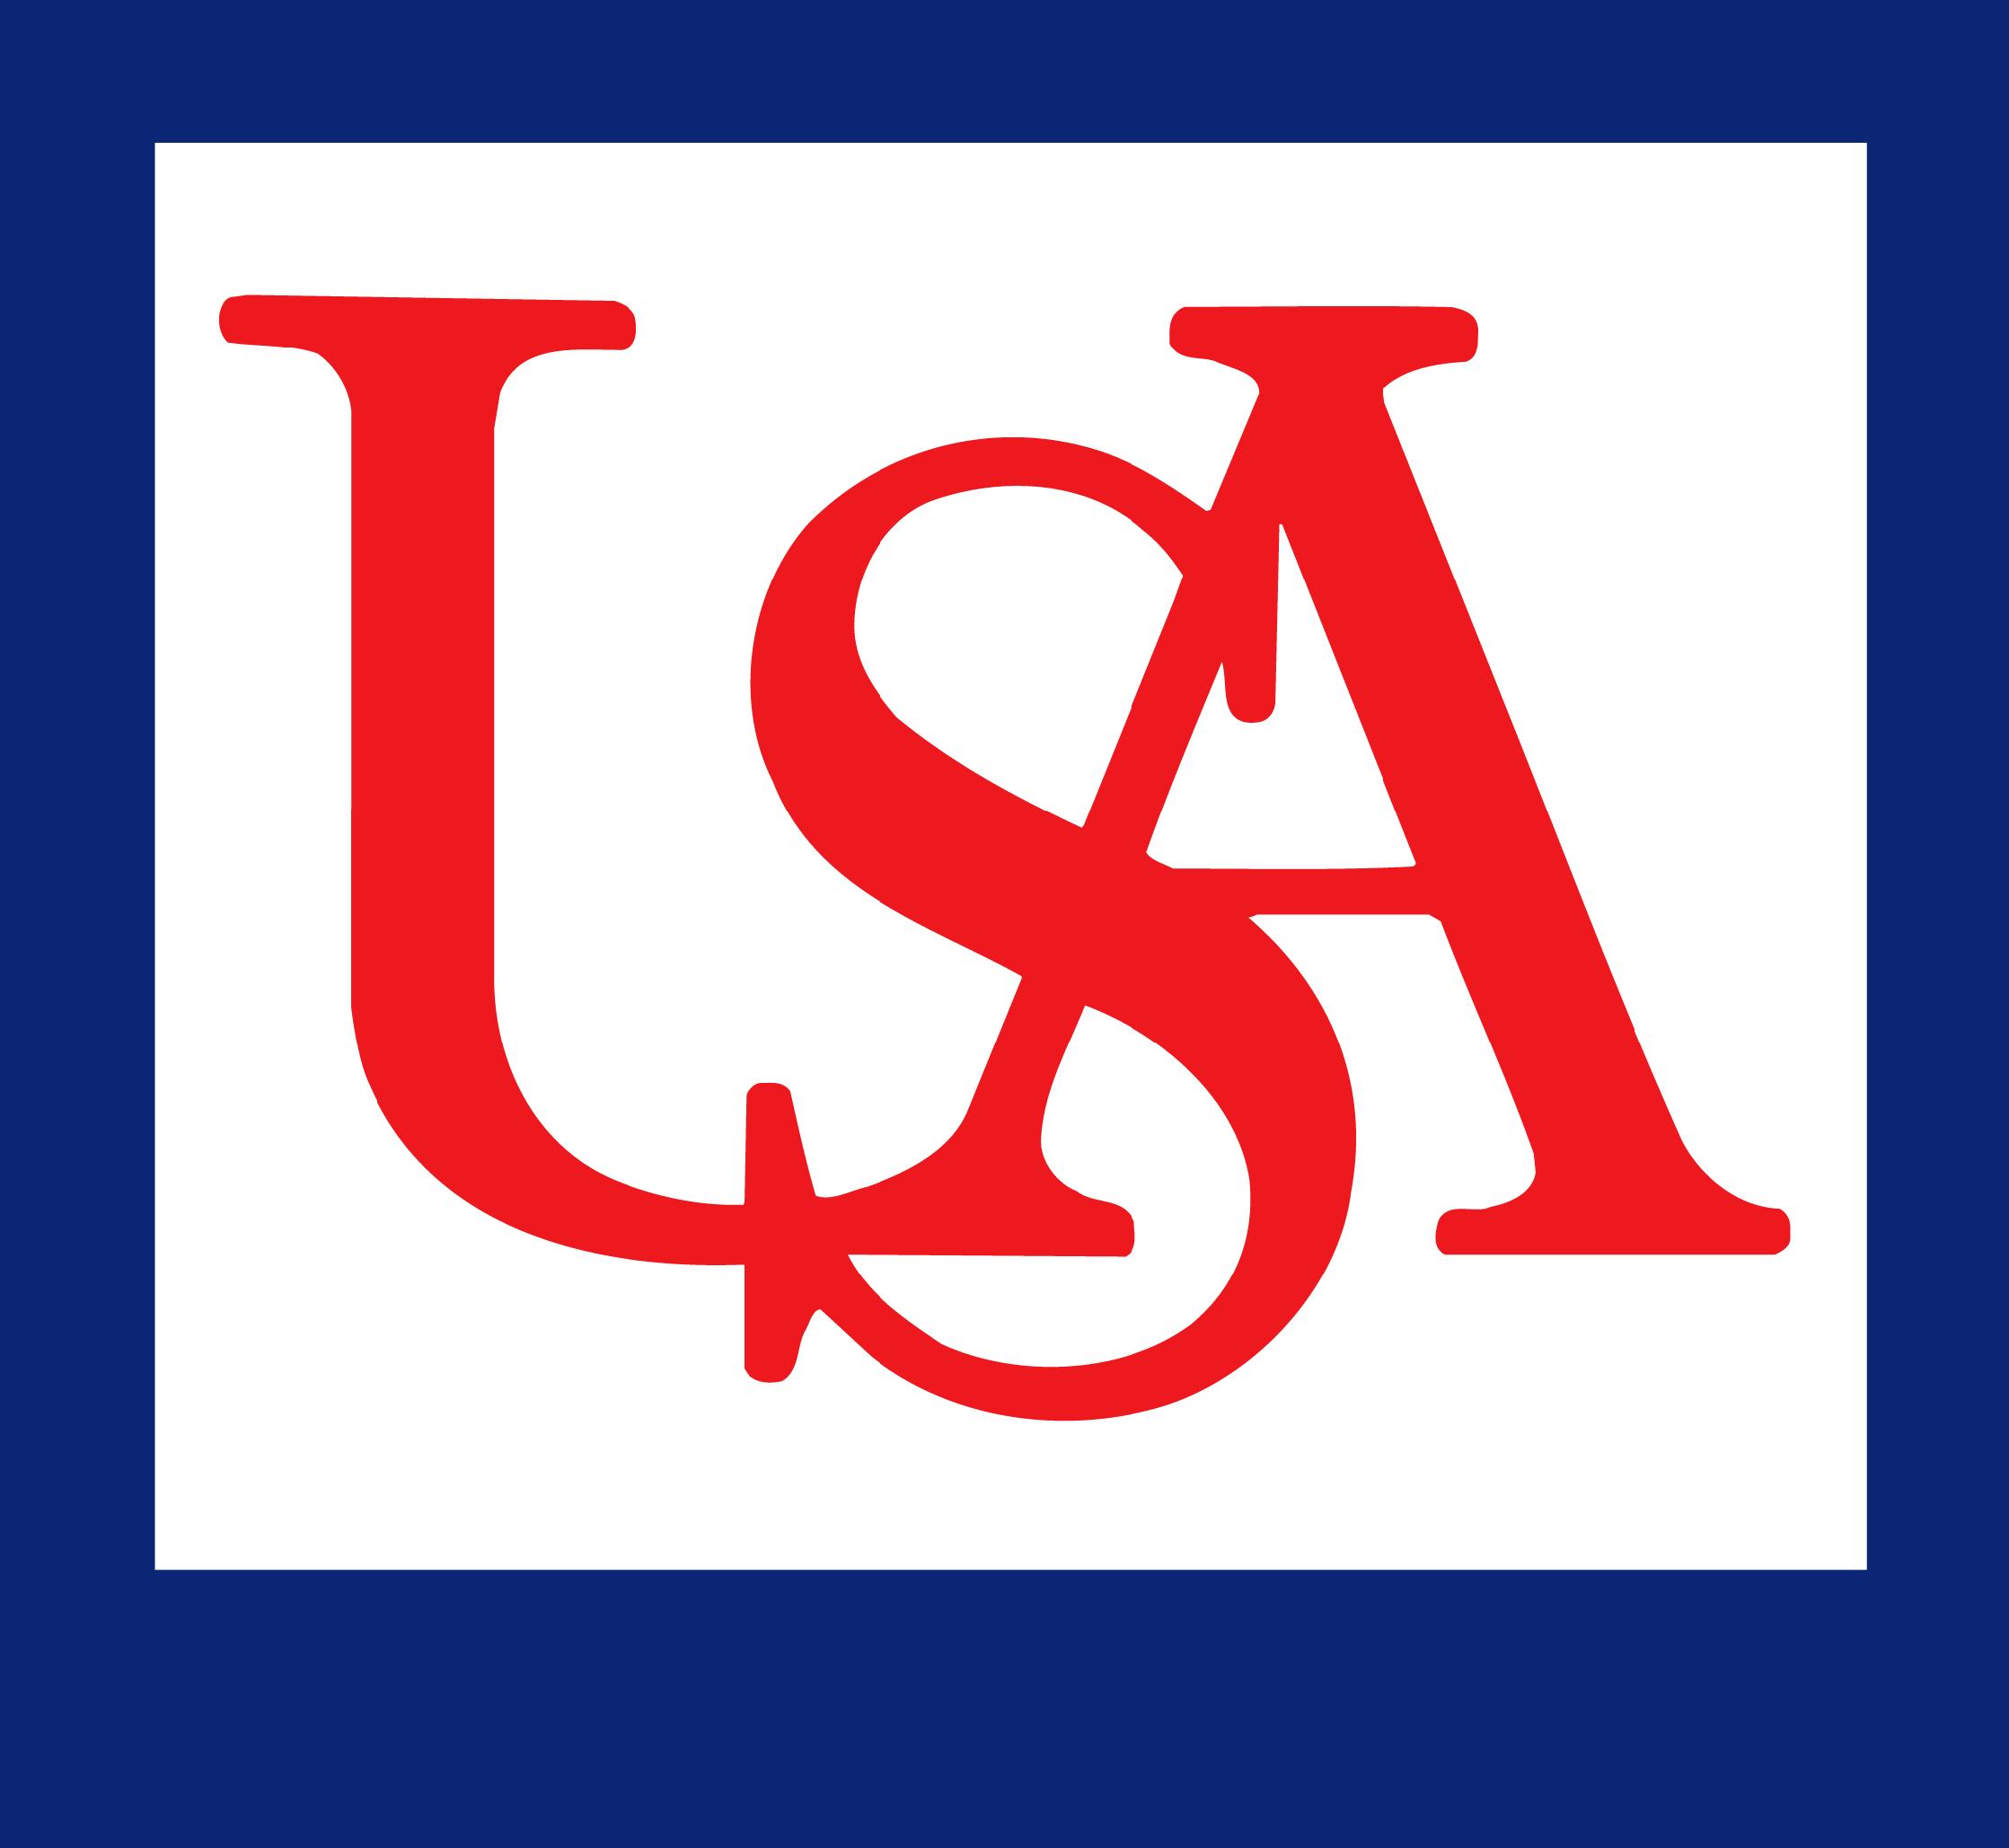 File:University of South Alabama logo.png.